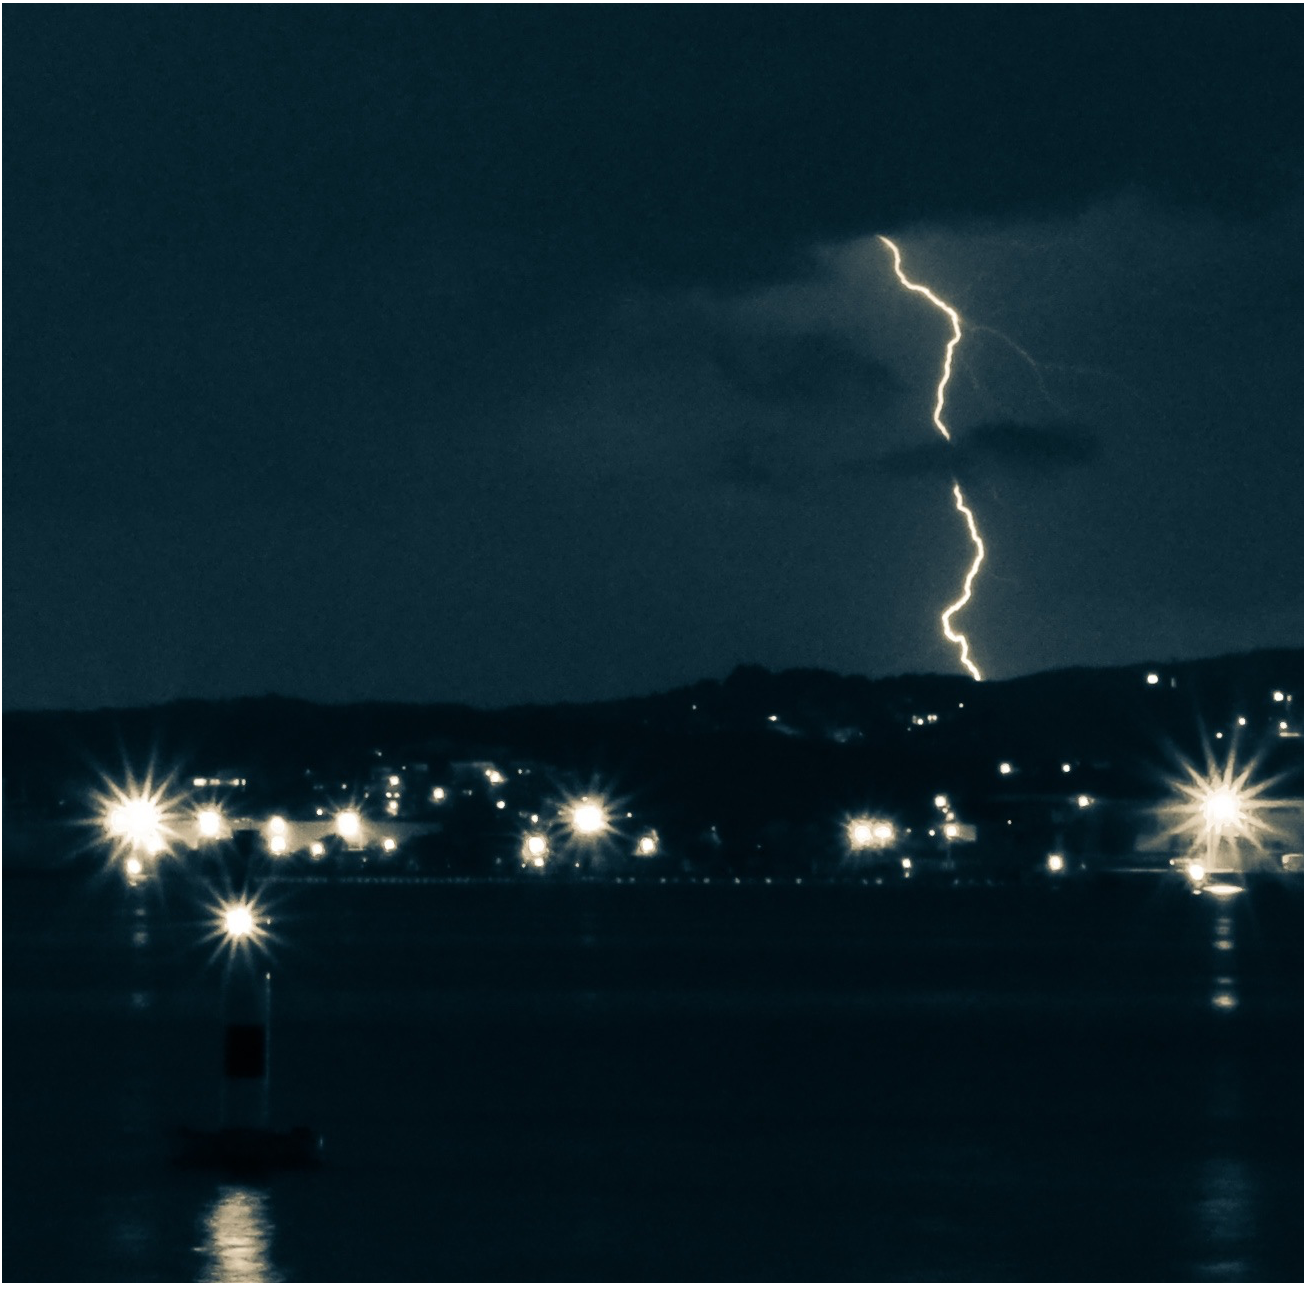 A lightening strike in the night